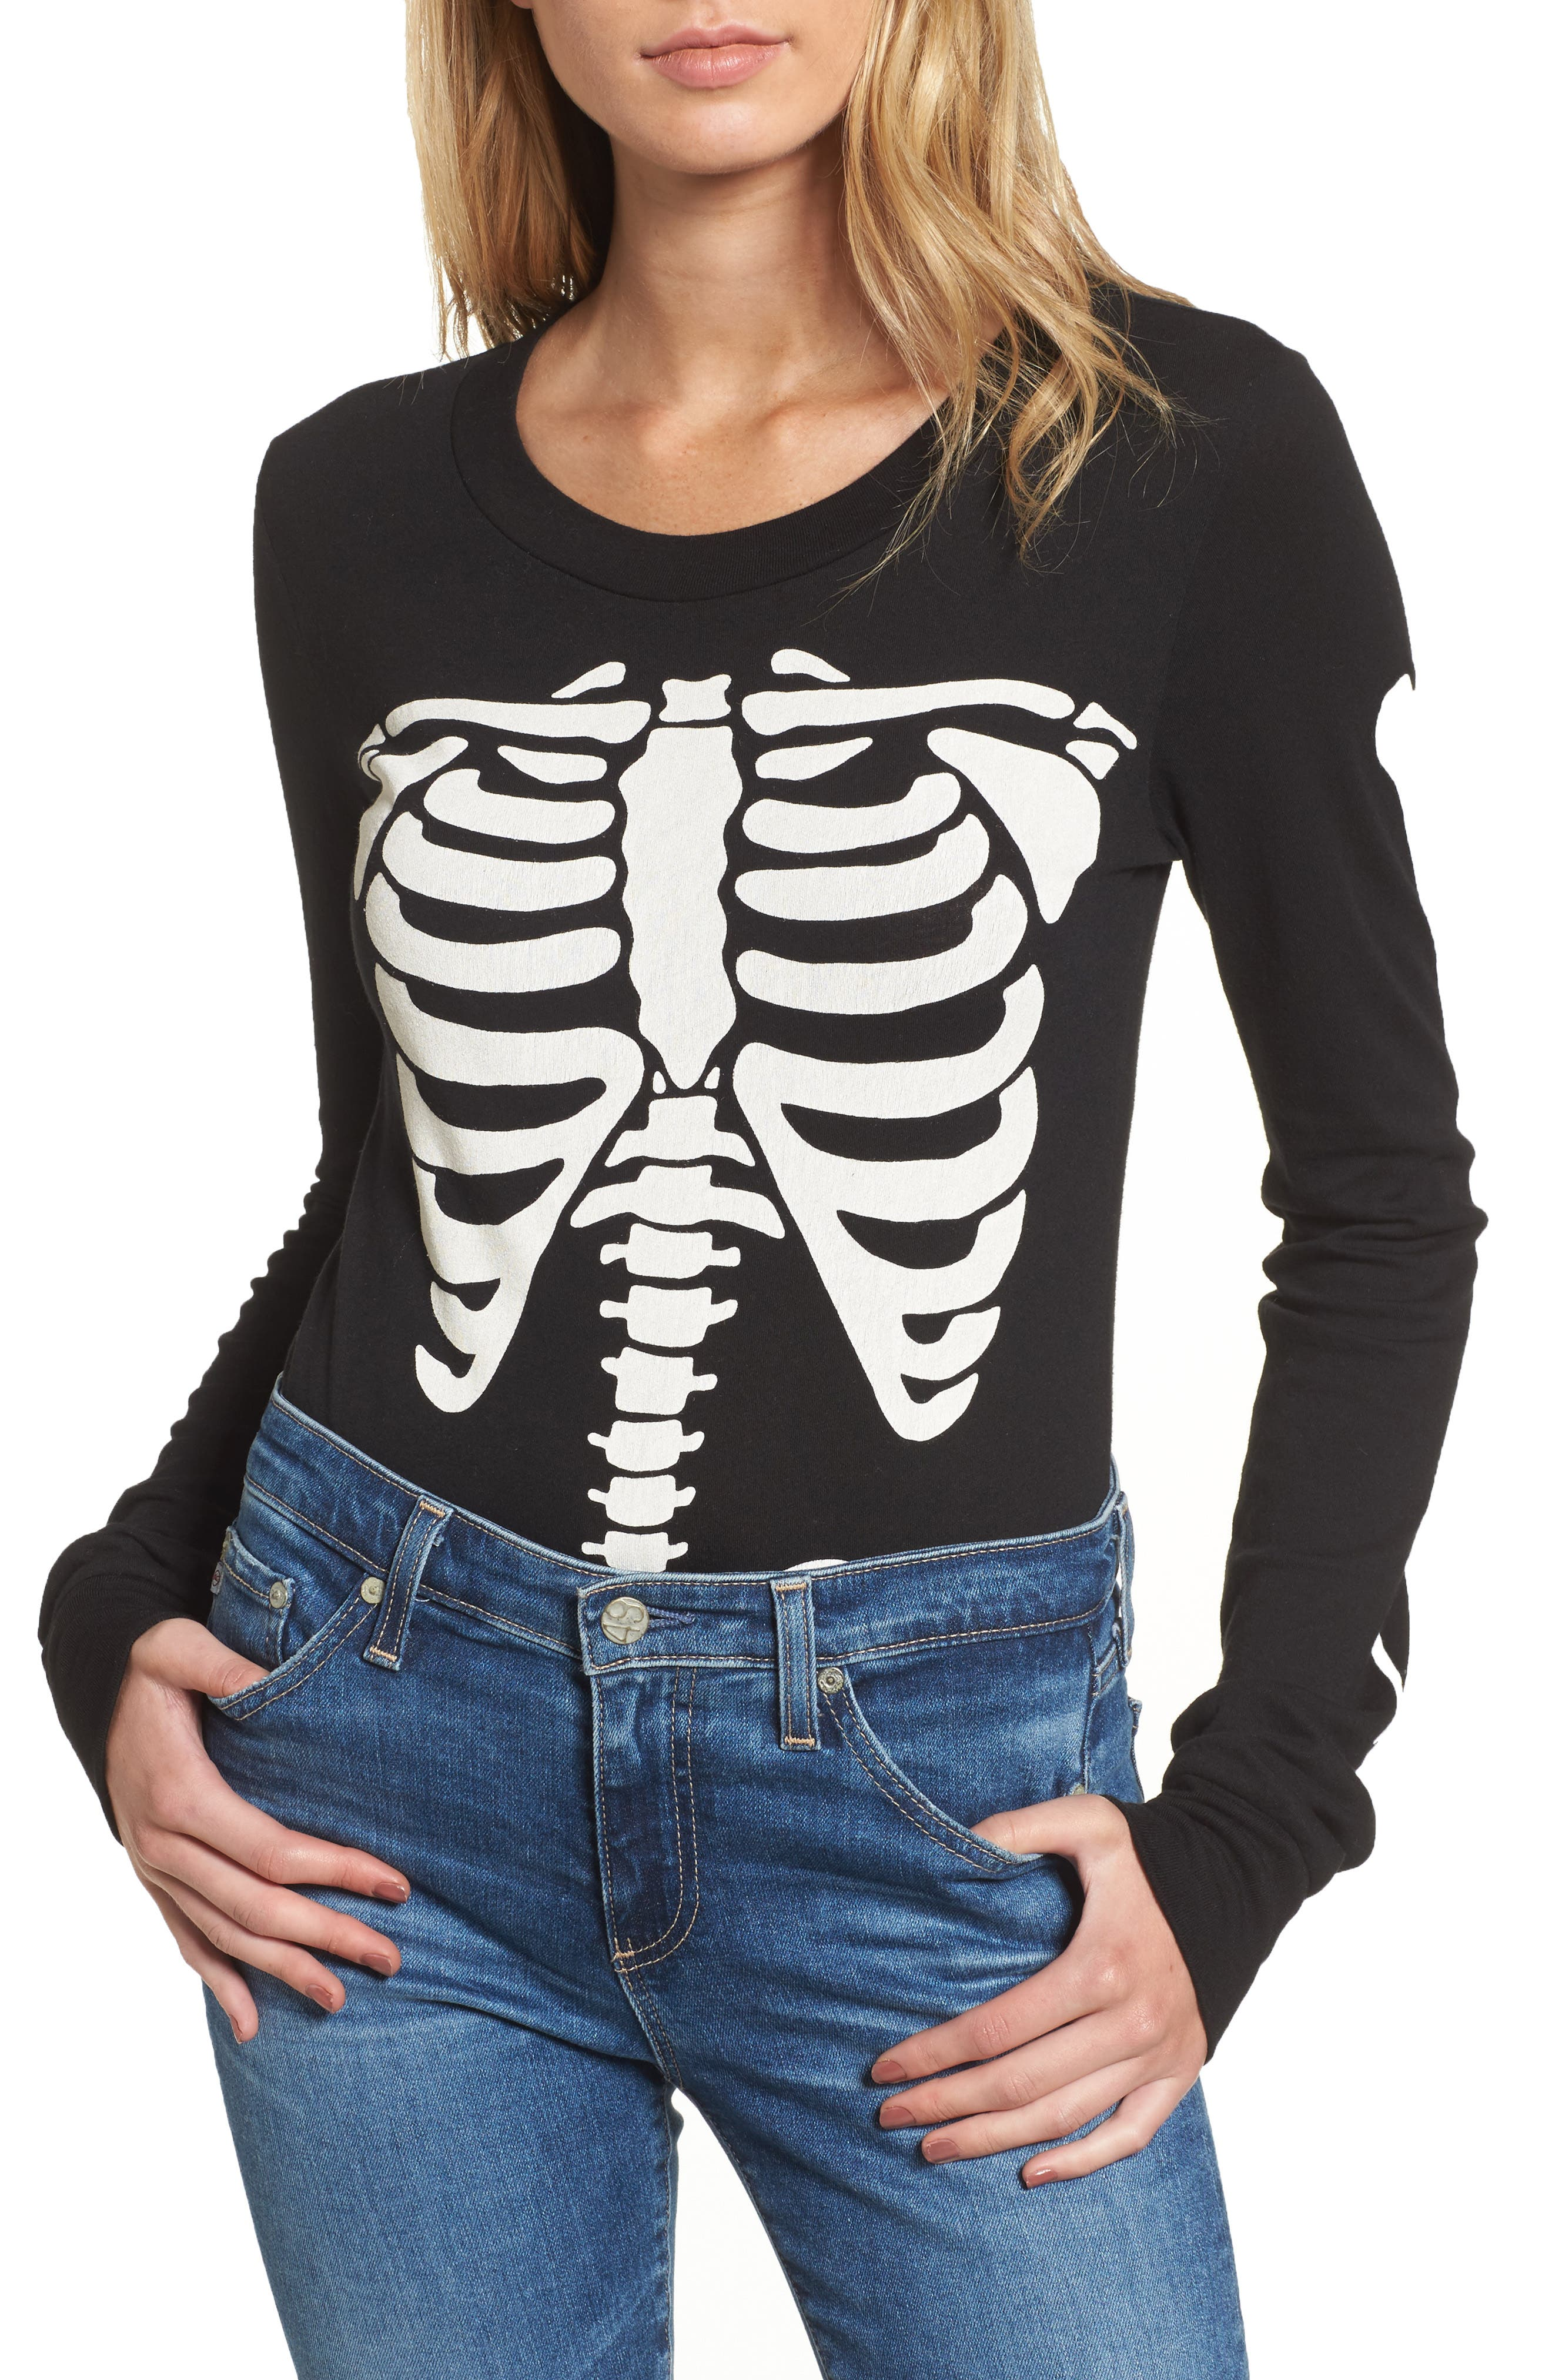 X-Ray Vision Bodysuit,                             Main thumbnail 1, color,                             Black